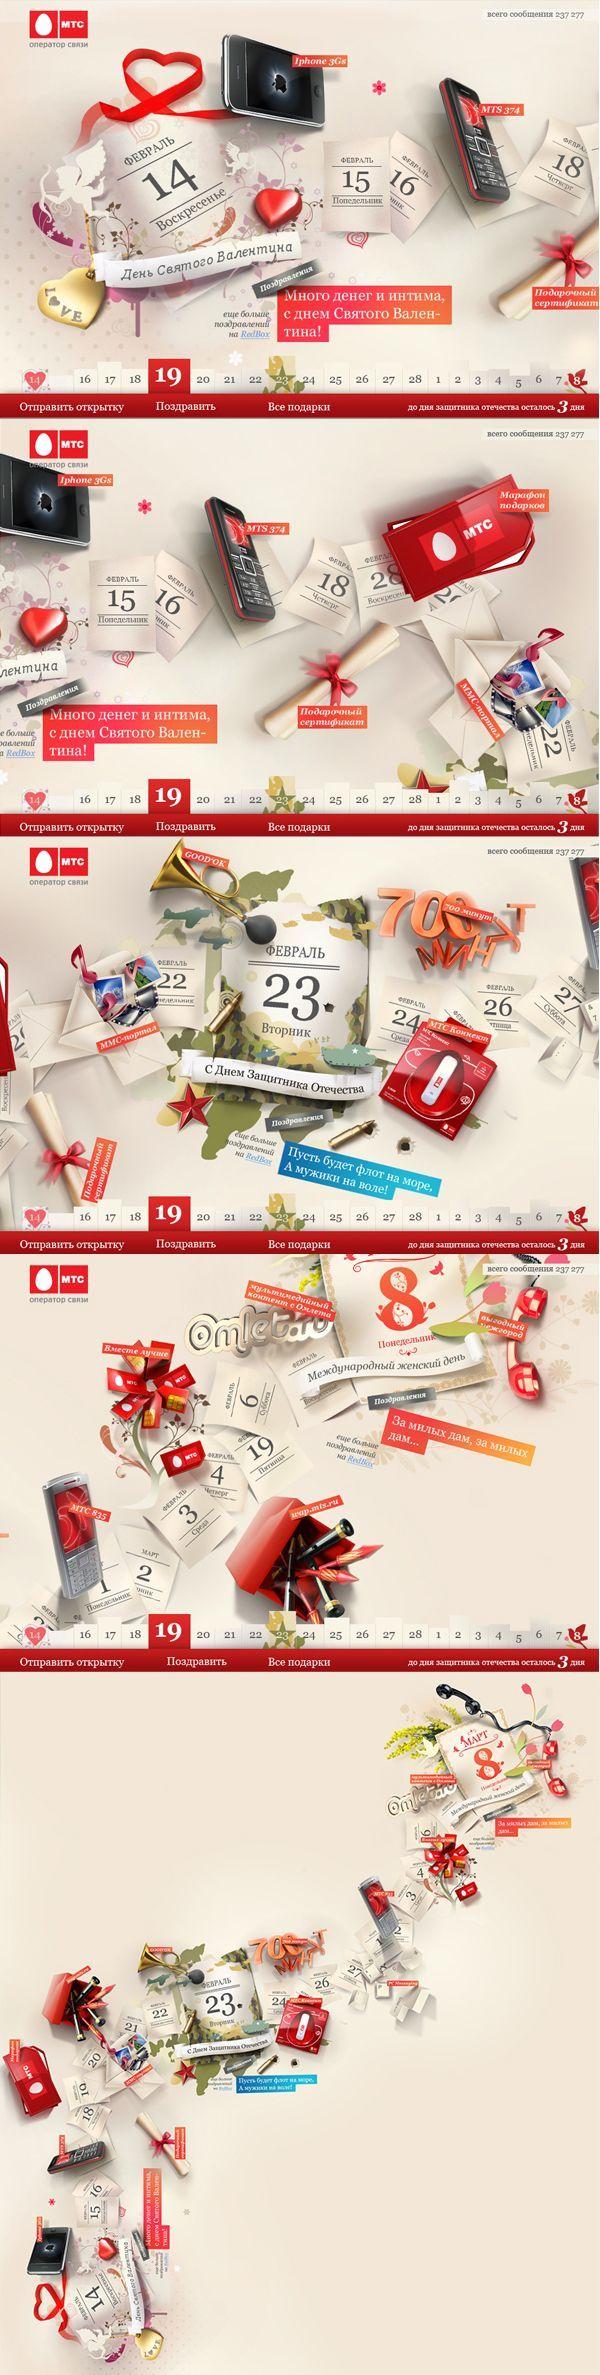 Ideas & Inspirations für Web Designs Holidays by Ruslan Latypov, via Behance Schweizer Webdesign http://www.swisswebwork.ch